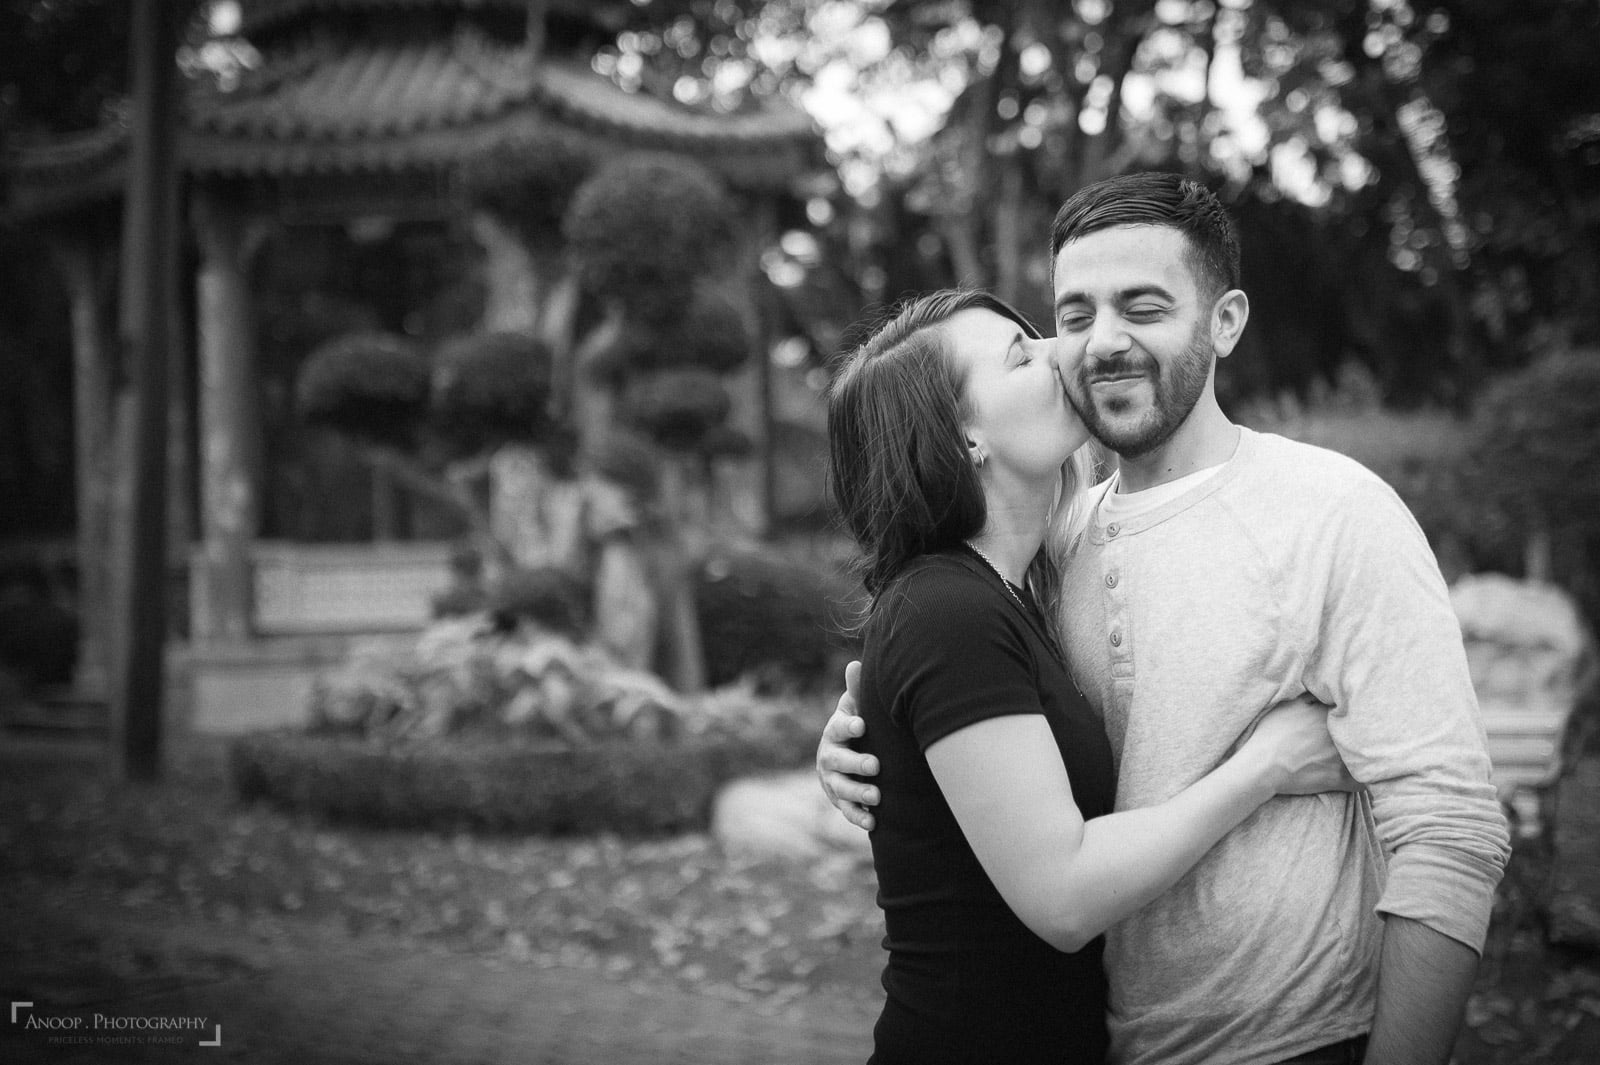 surprise-proposal-photography-thailand-marriage-proposal-ideas-photos18